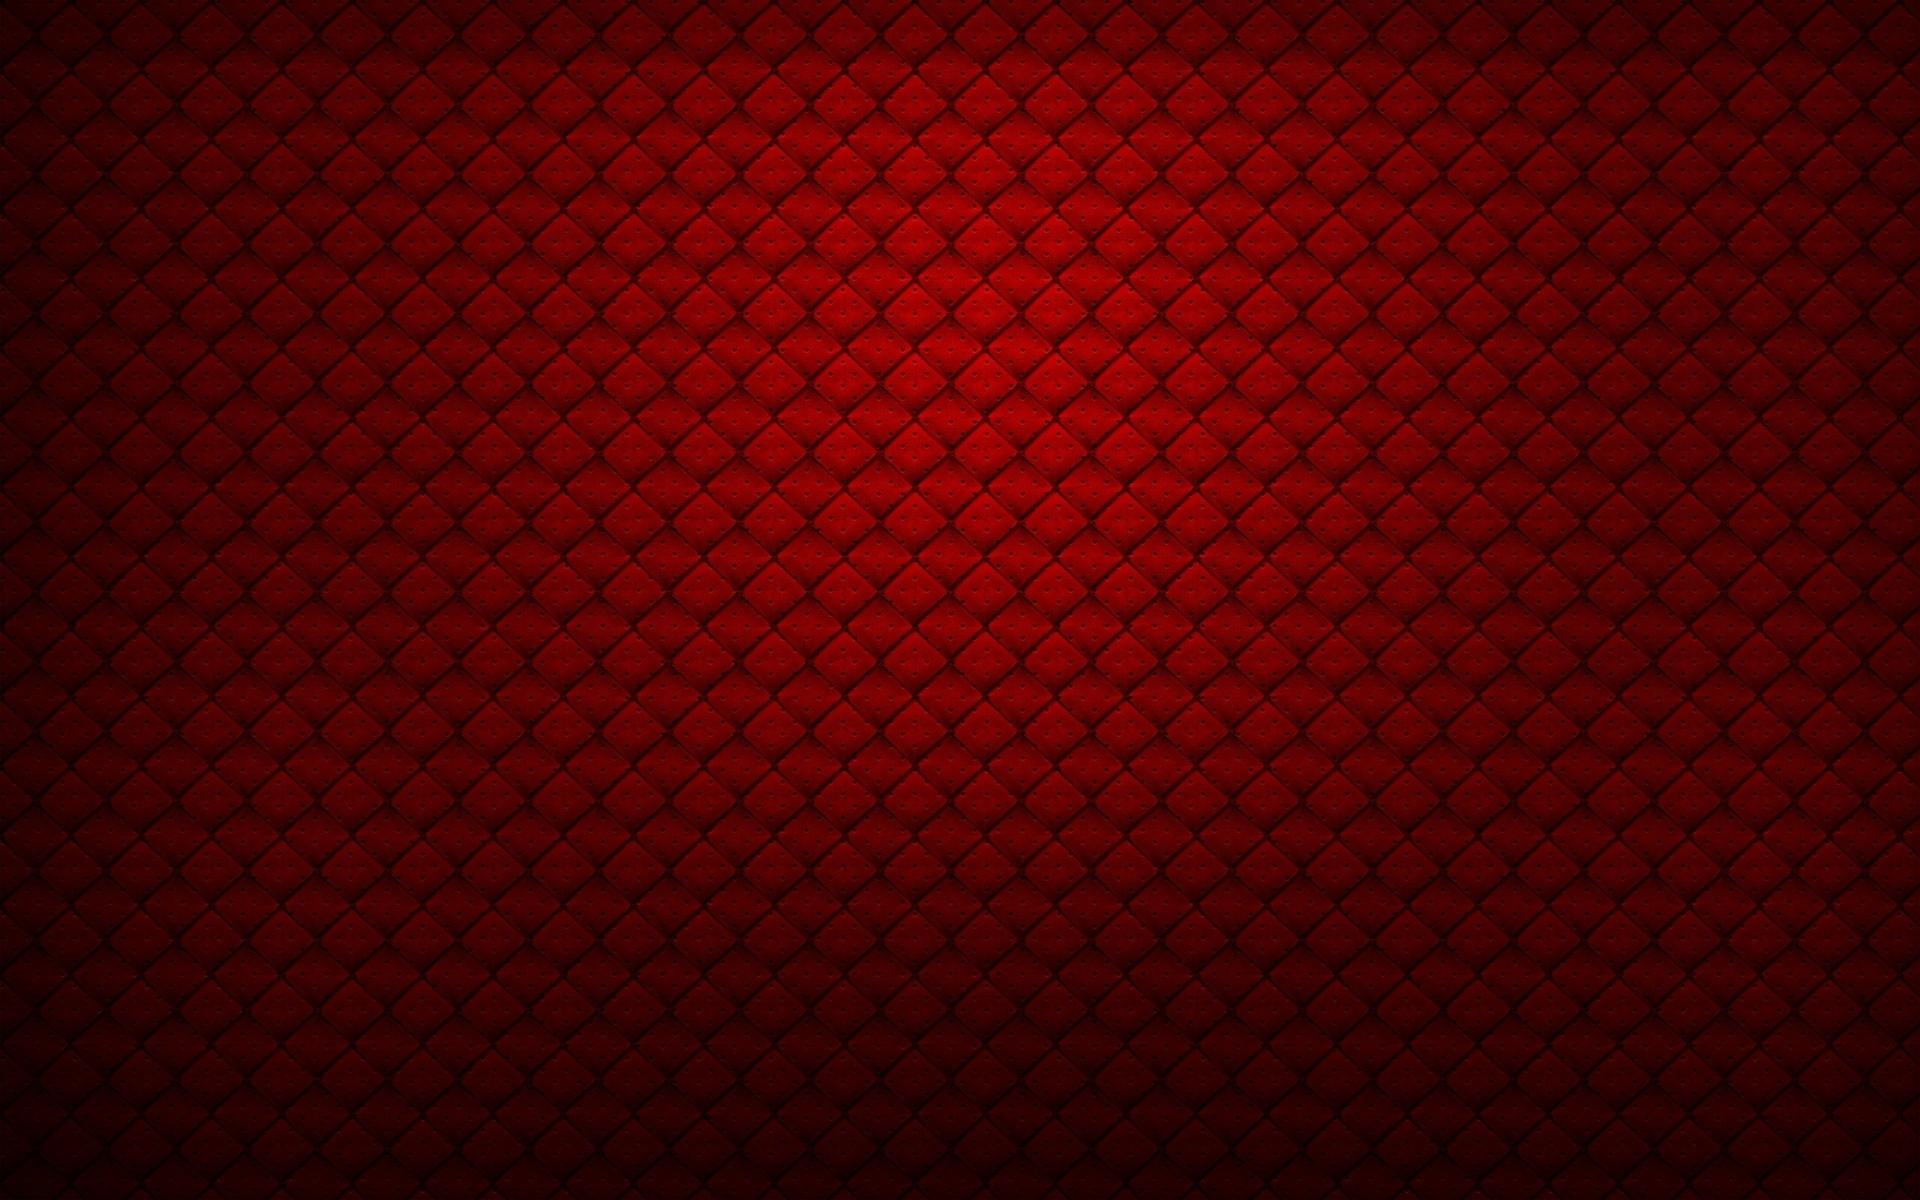 Hintergrundbilder Muster Schatten Hell Textur 1920x1200